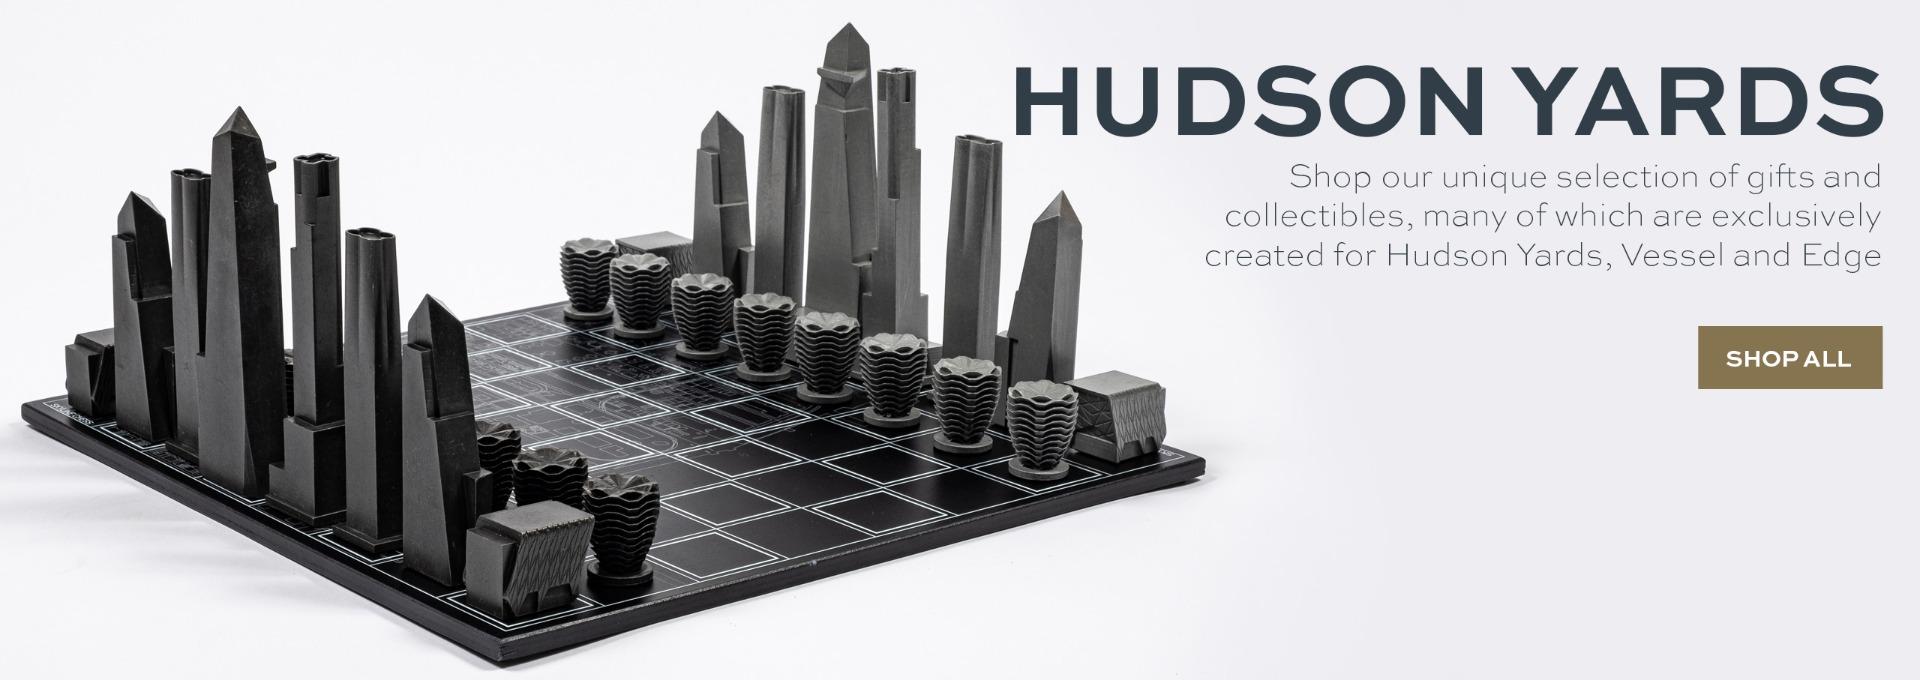 Hudson Yards New York - Shop-All